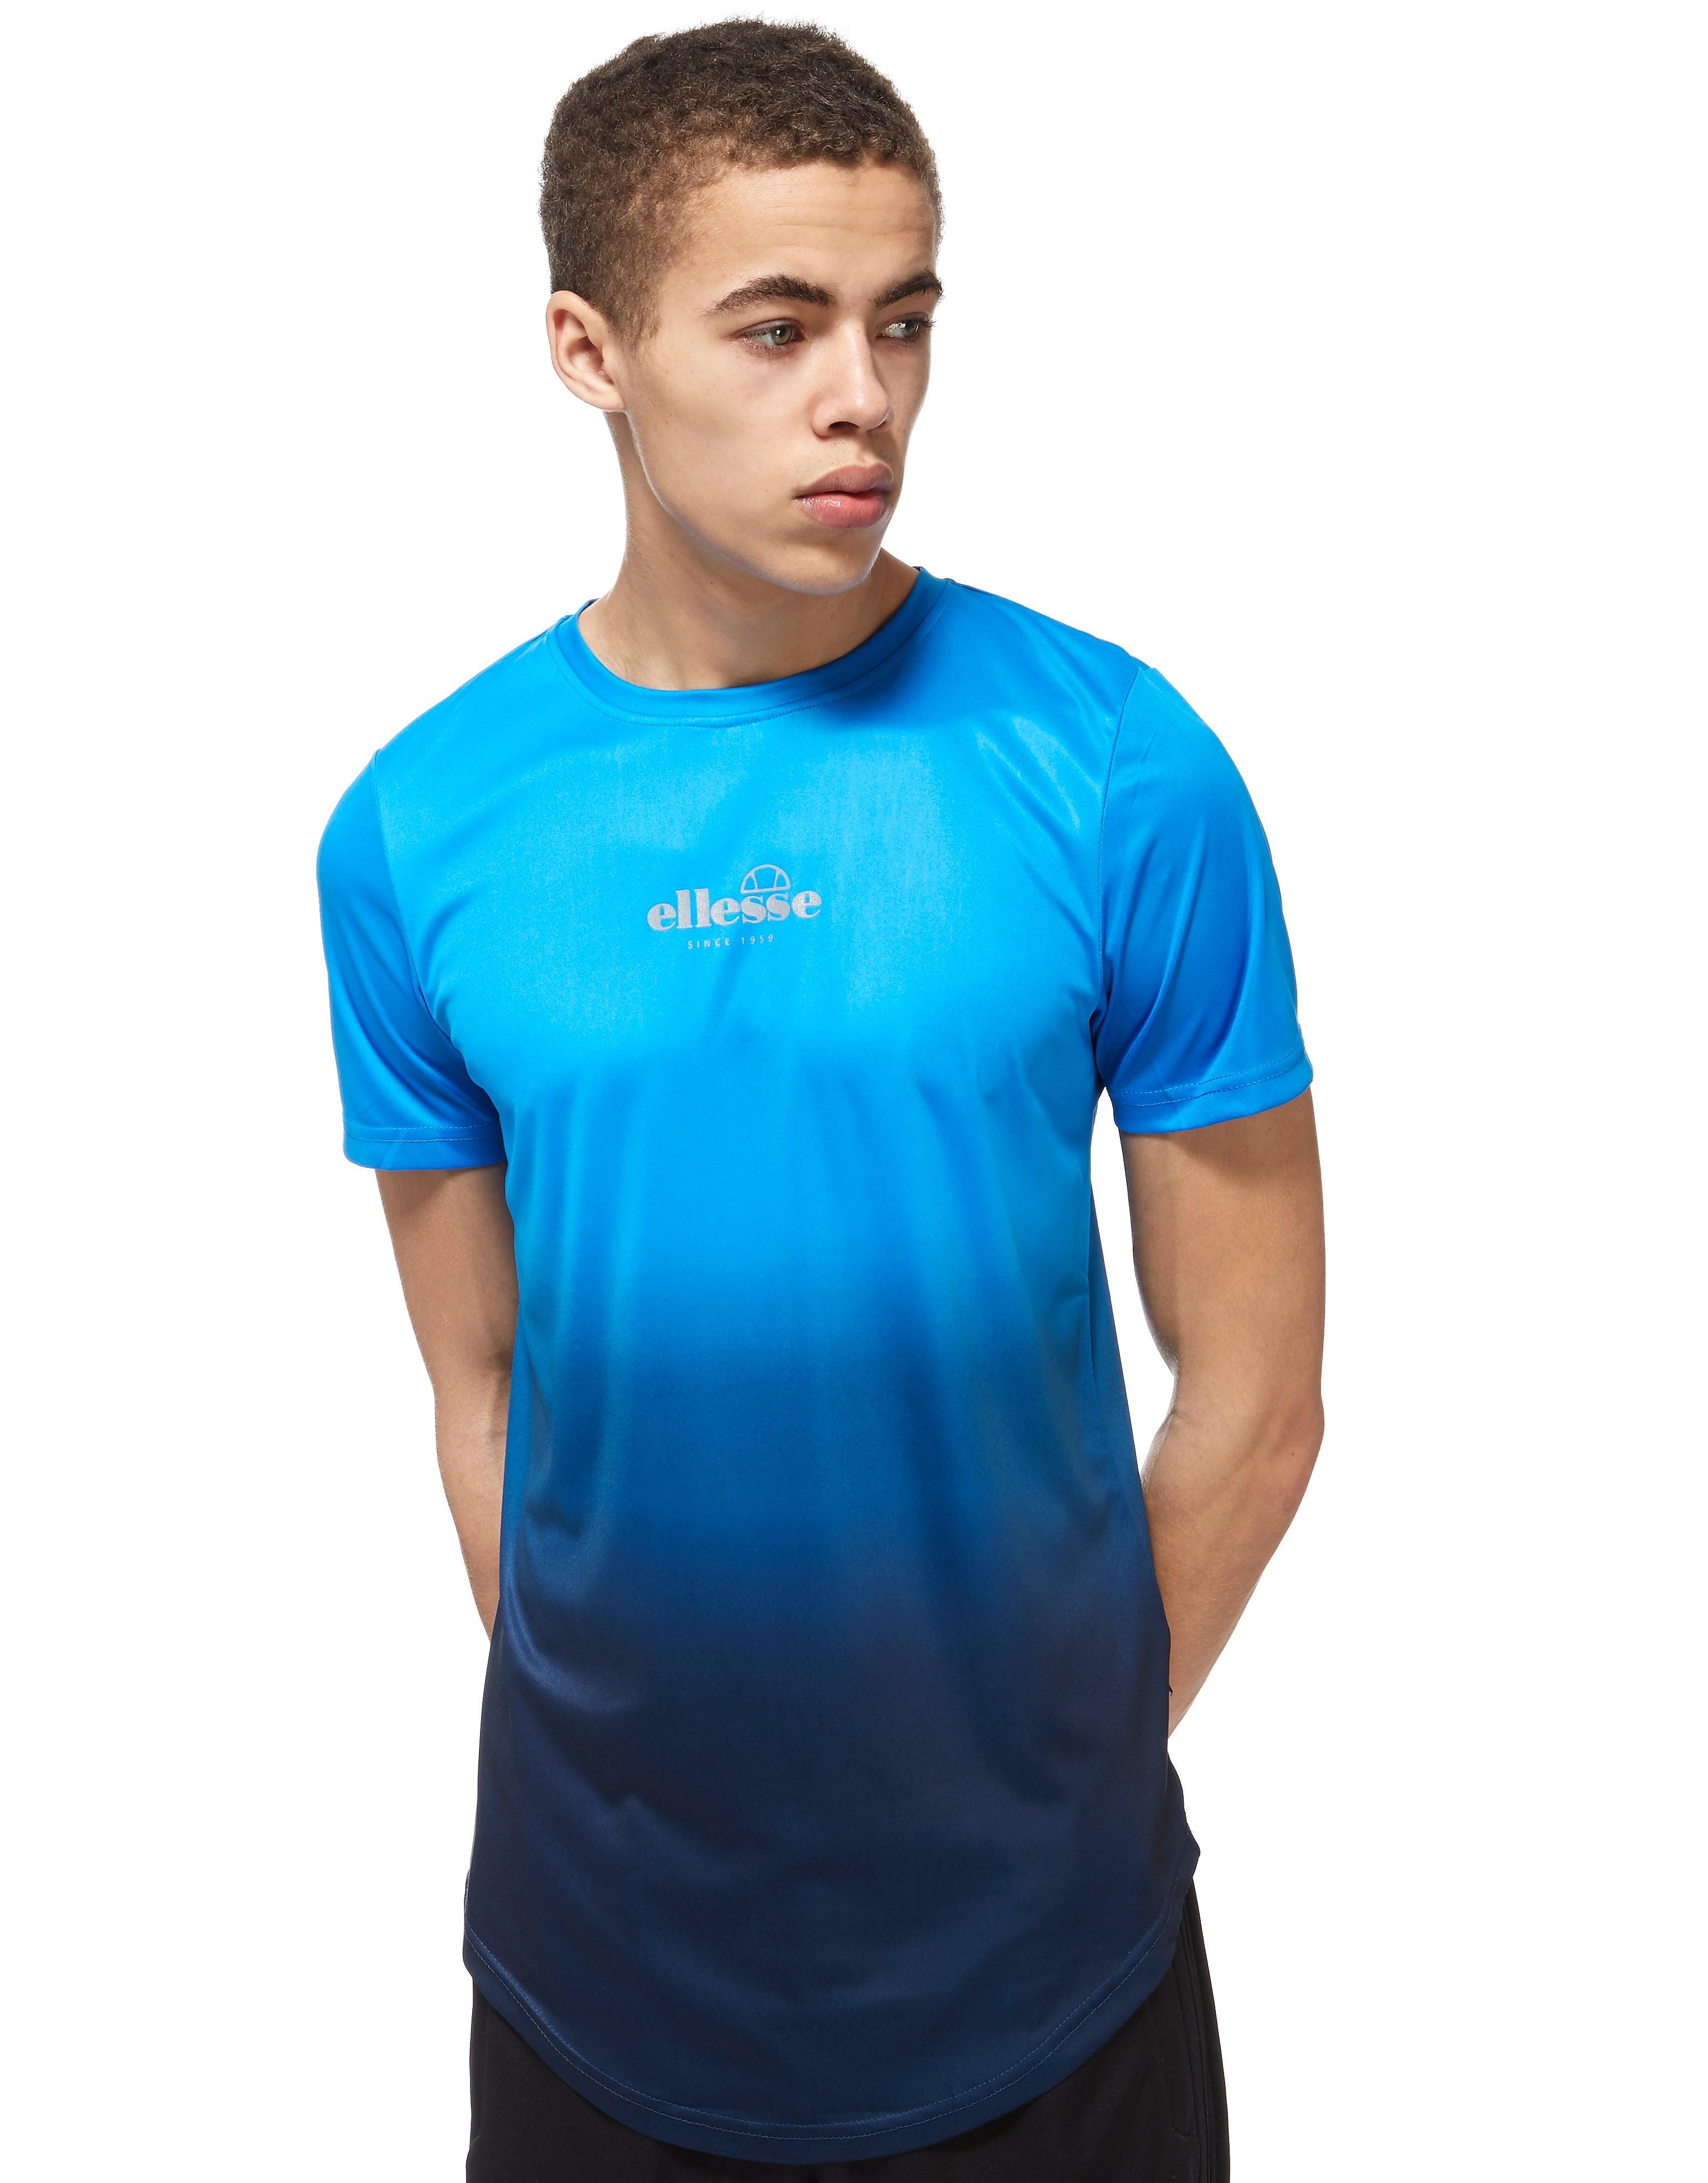 Ellesse Nickolino Fade T-Shirt